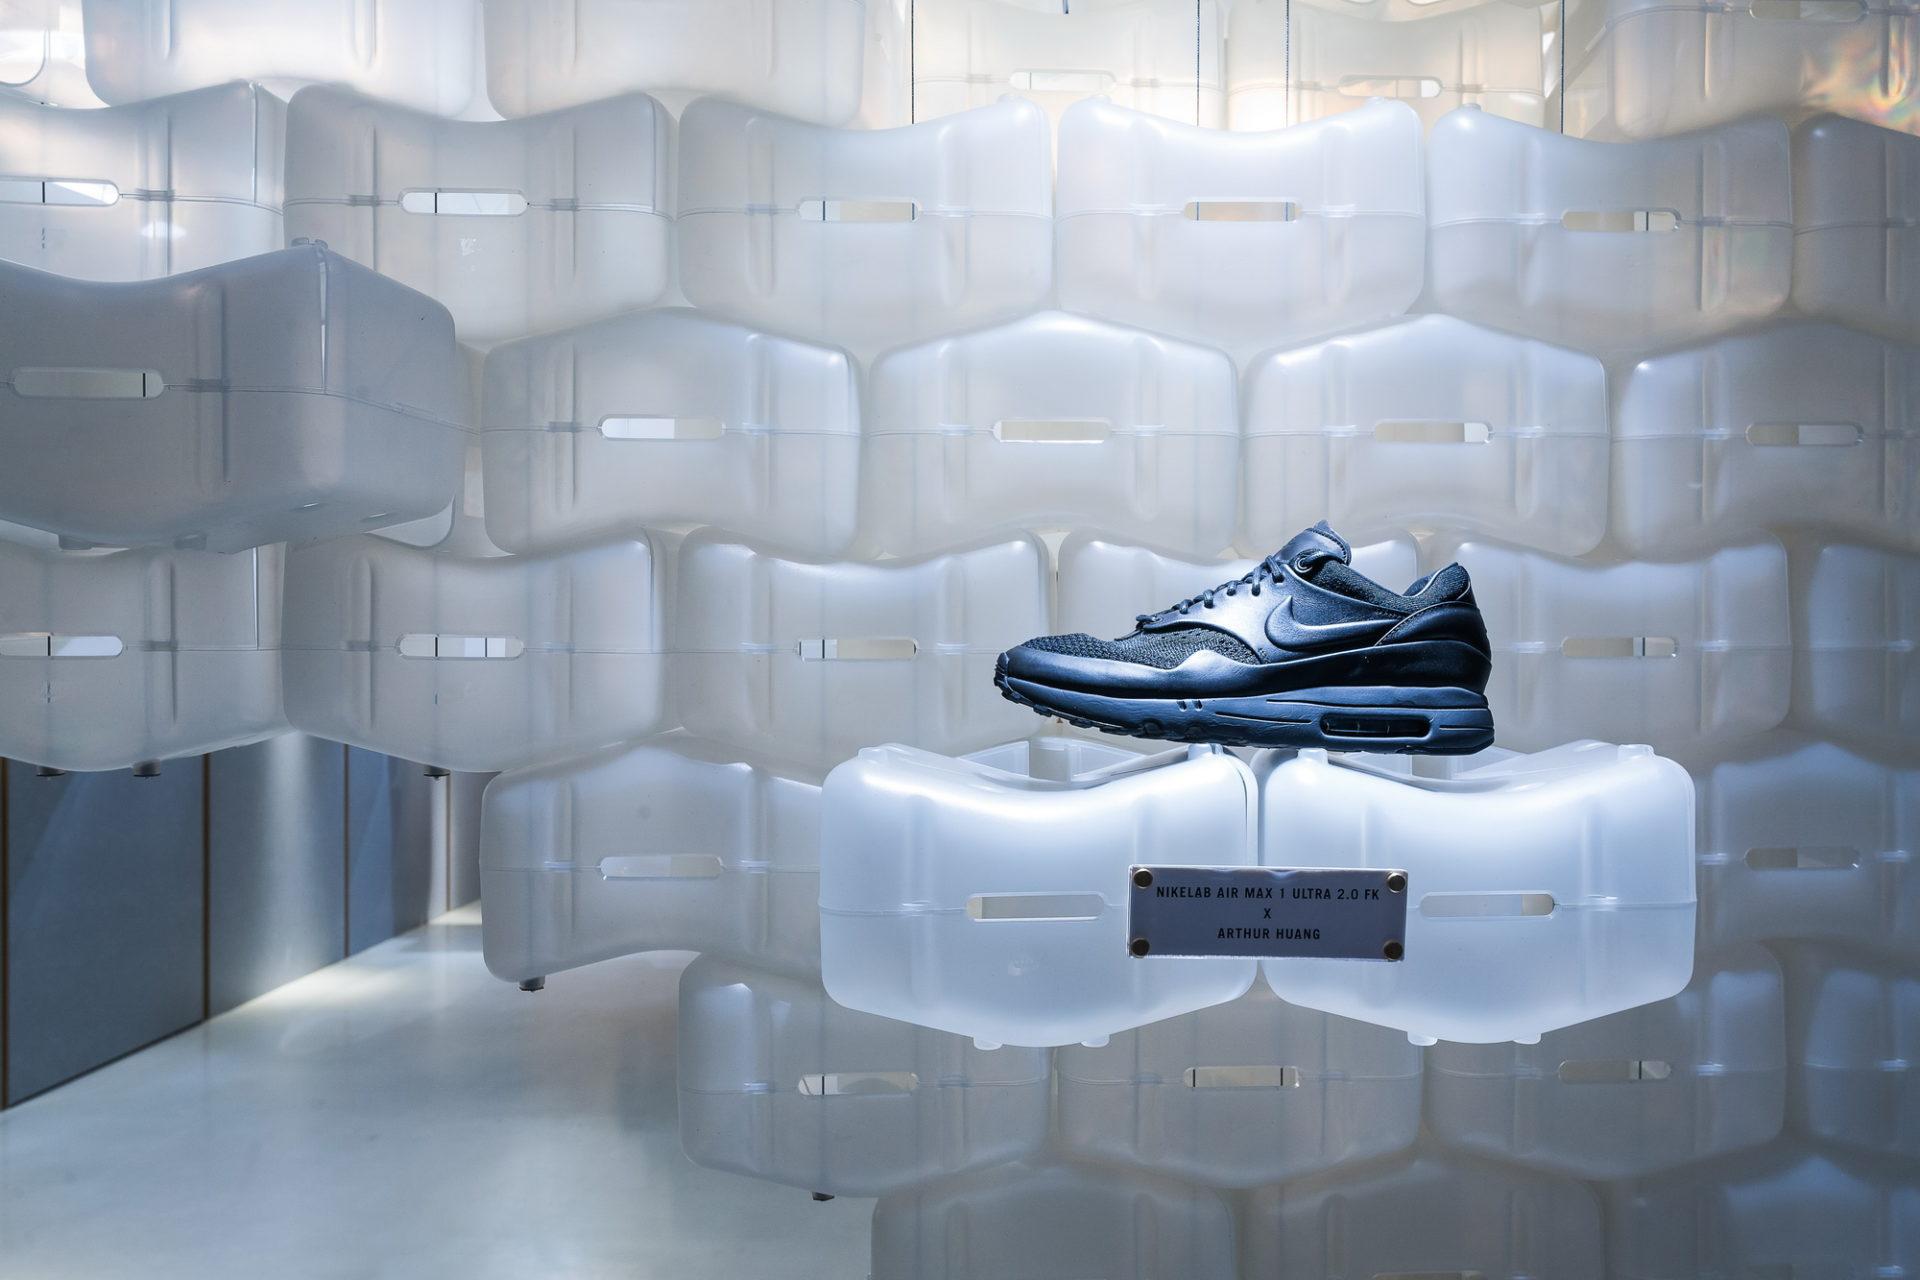 quality design dad25 8c780 VisionAIR Arthur Huang Creates Special Packaging for Nike Air Max 1 FK Royal